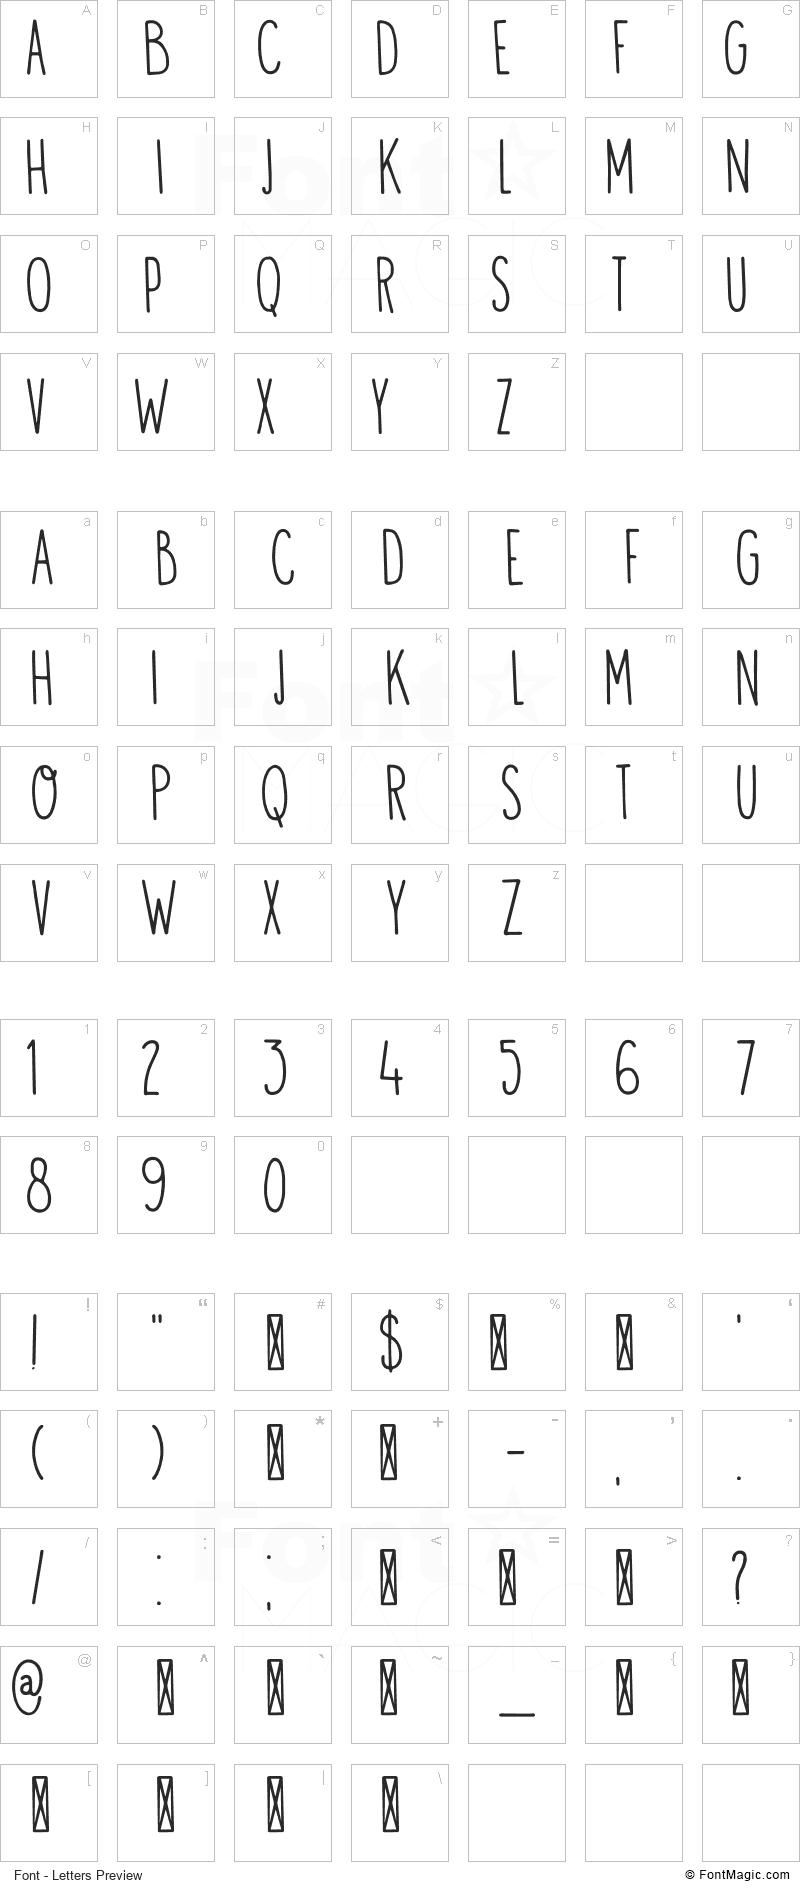 Visum Font - All Latters Preview Chart